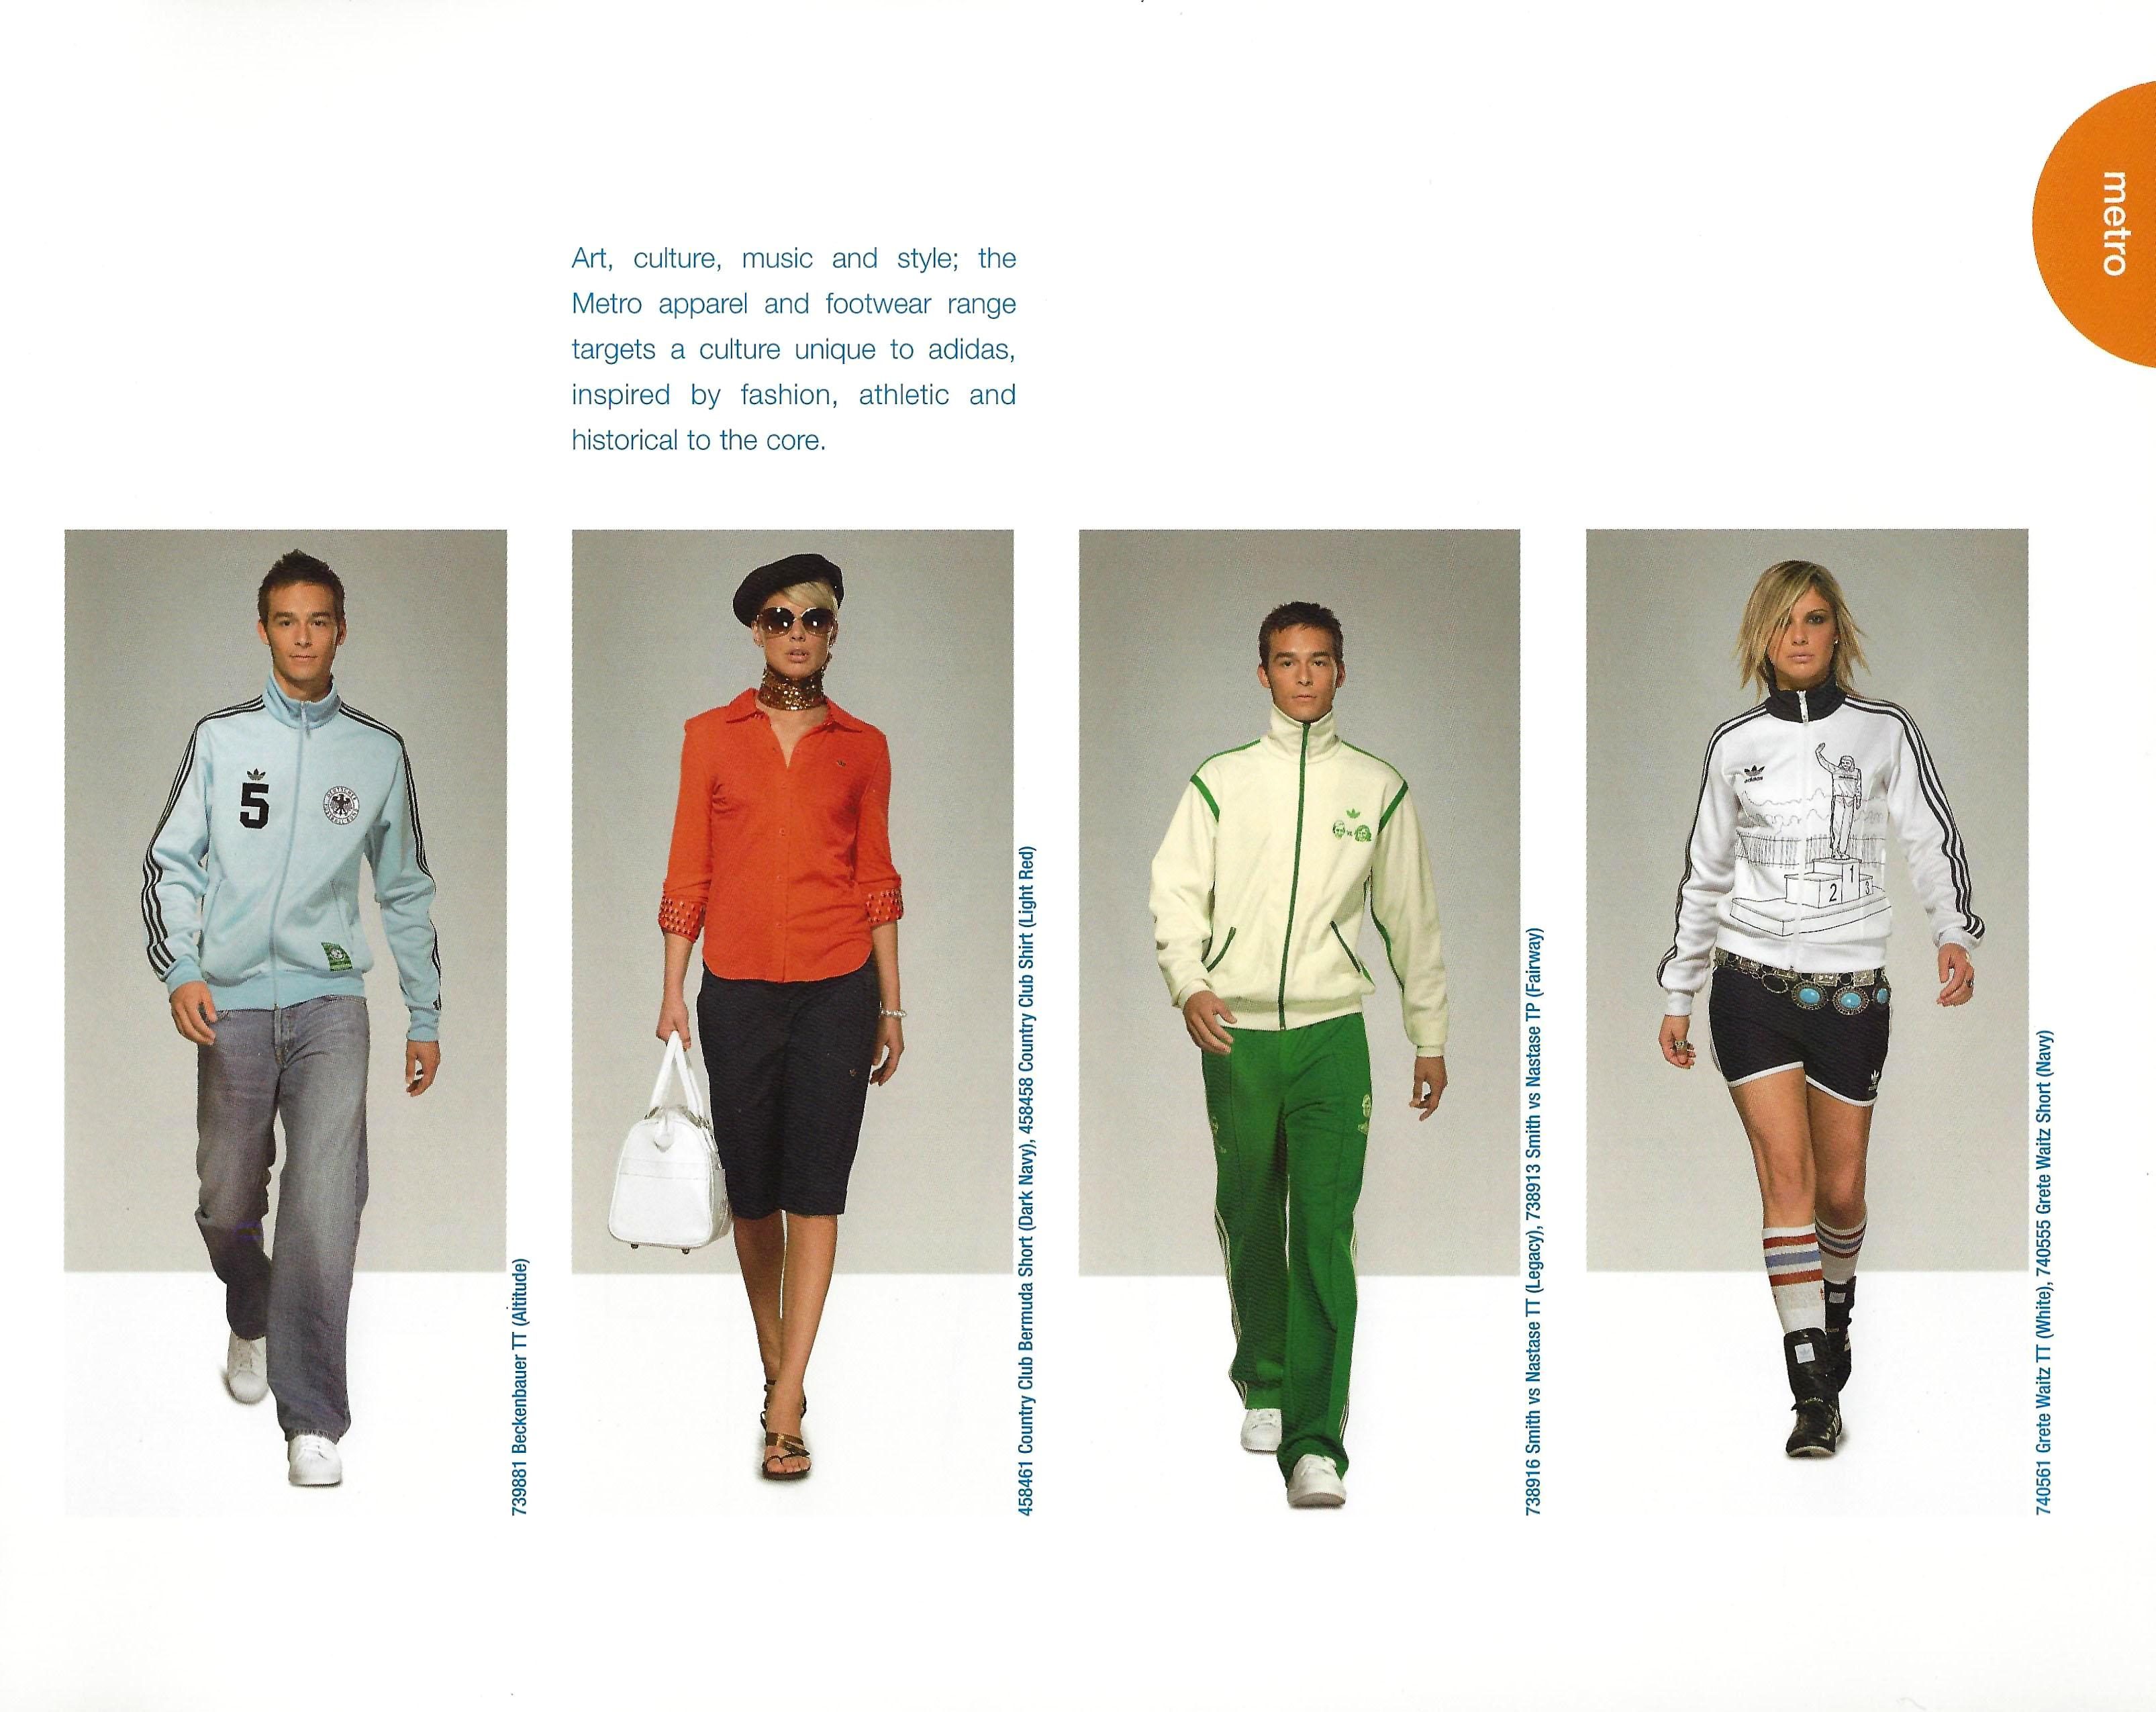 AdidasCatalouge 1.jpg